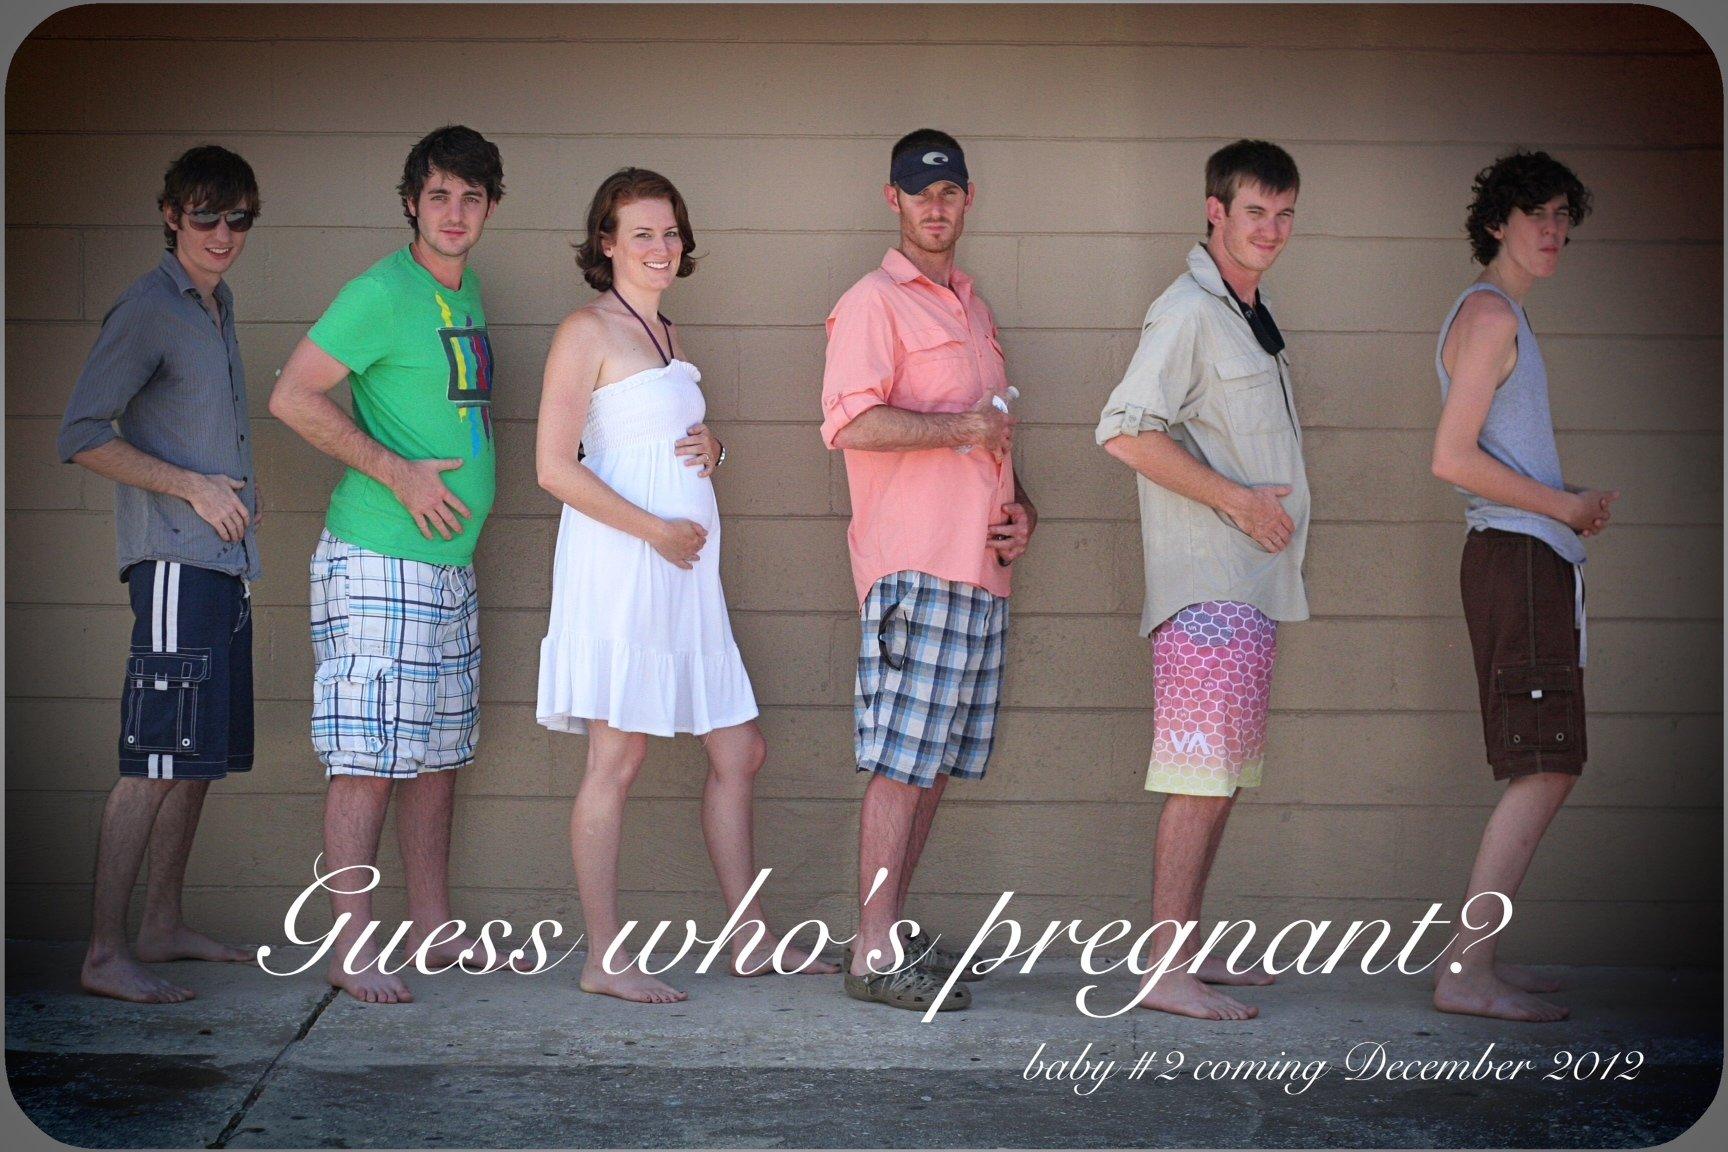 10 Fantastic Creative Ideas To Announce Pregnancy unique family photo pregnancy announcement ideas selection photo 2 2020